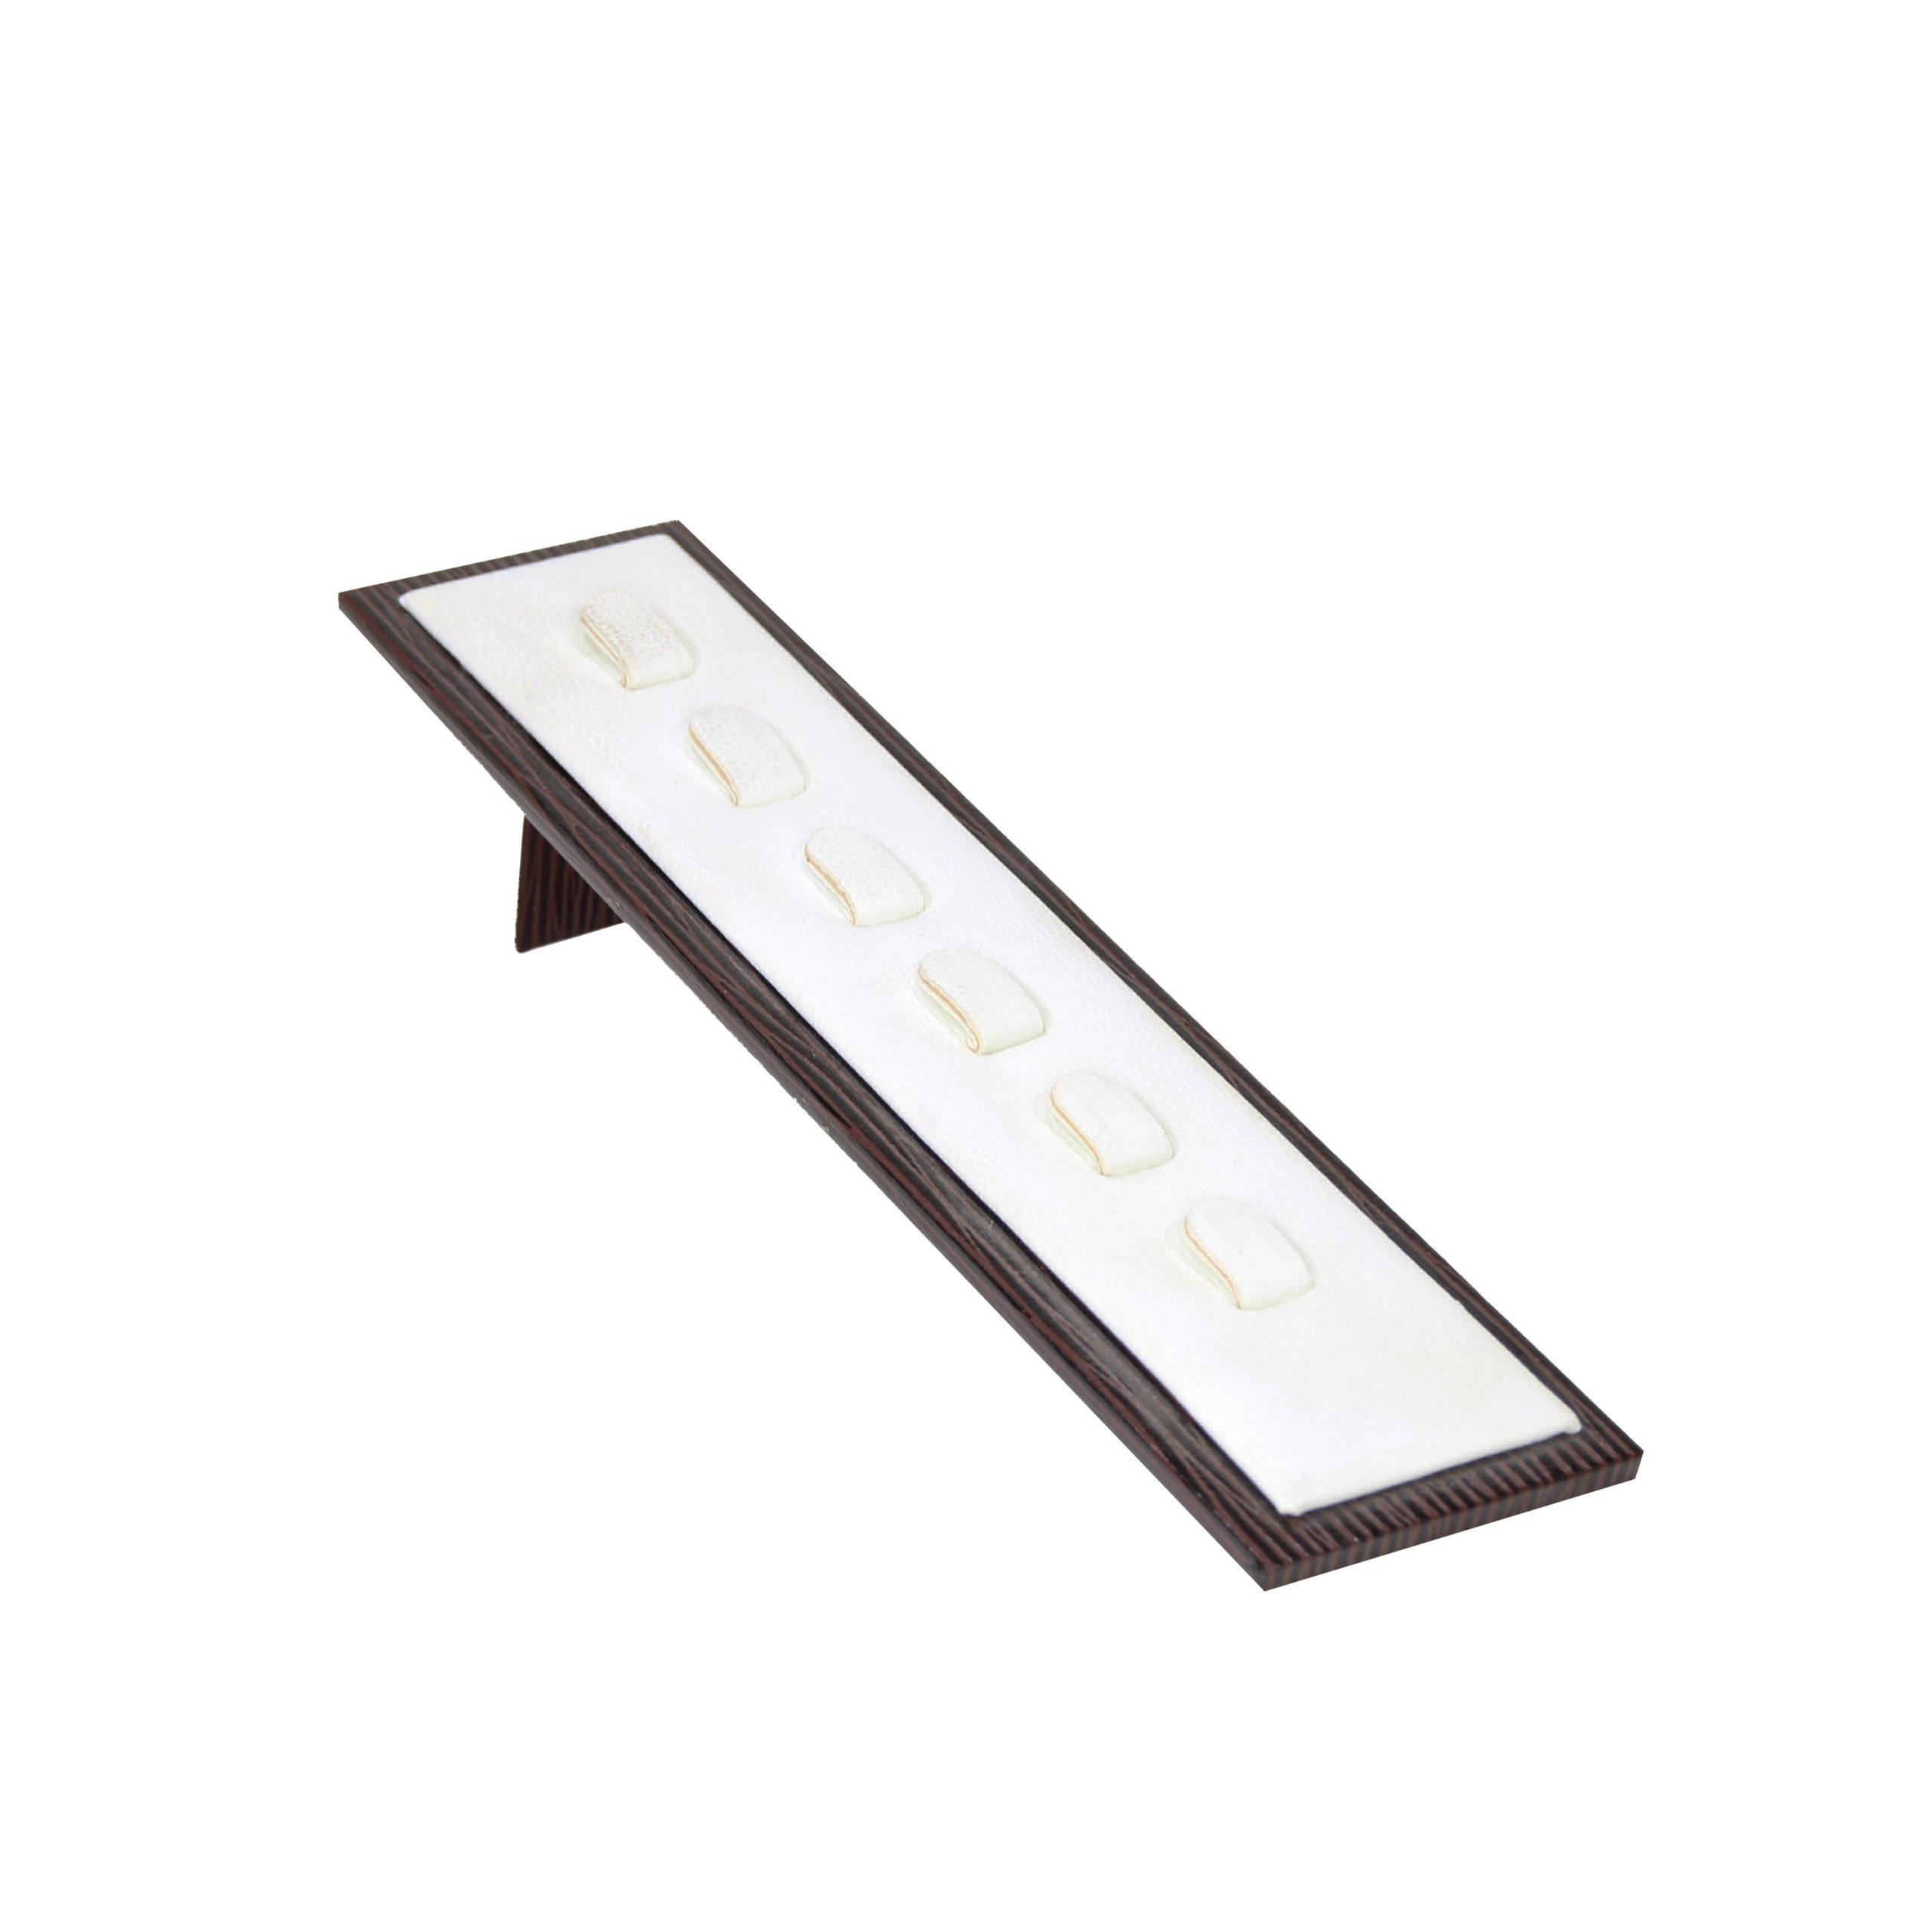 Подставка наклонная под 6 колец (170х40) 170001